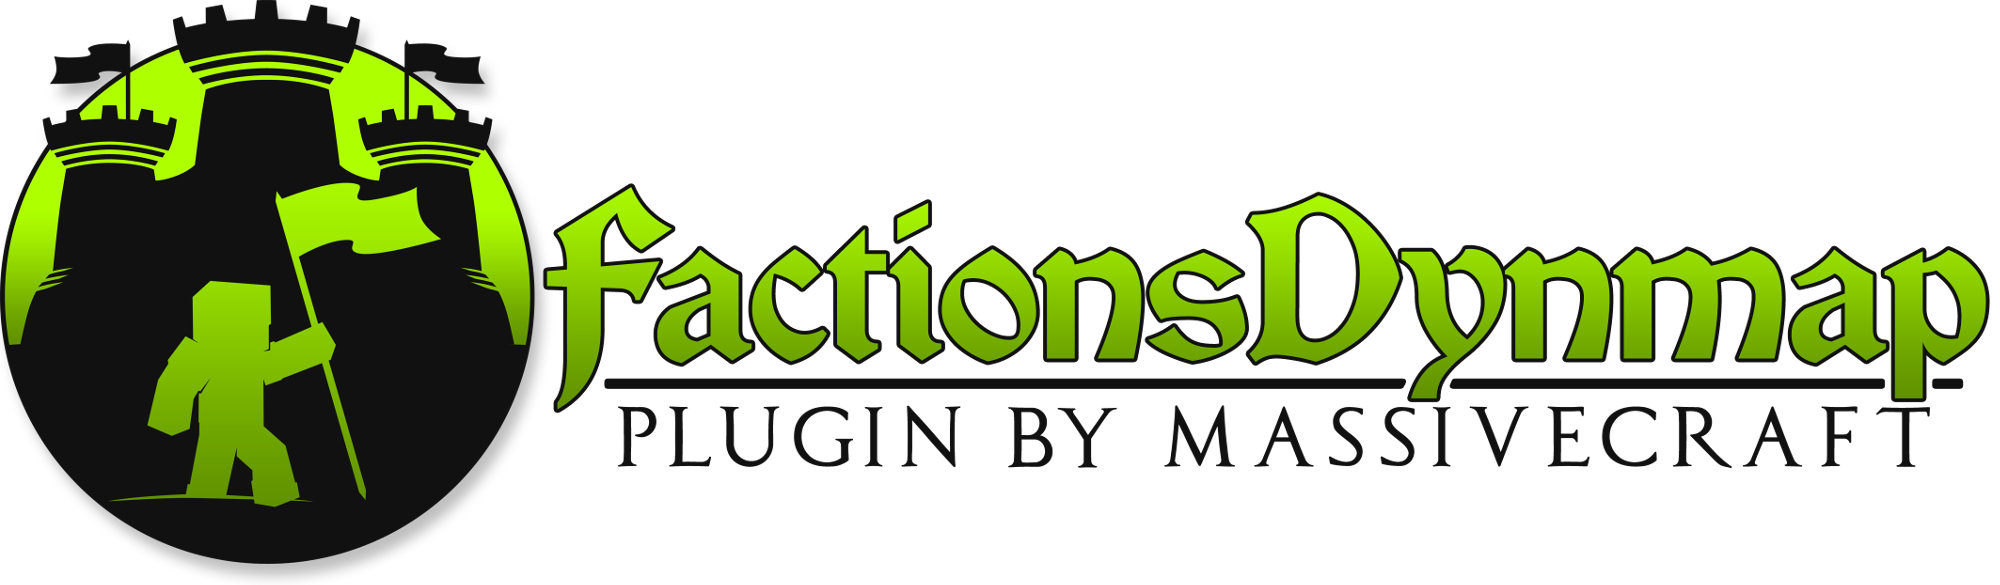 massivecraft-logotype-plugin-factionsdynmap-2000